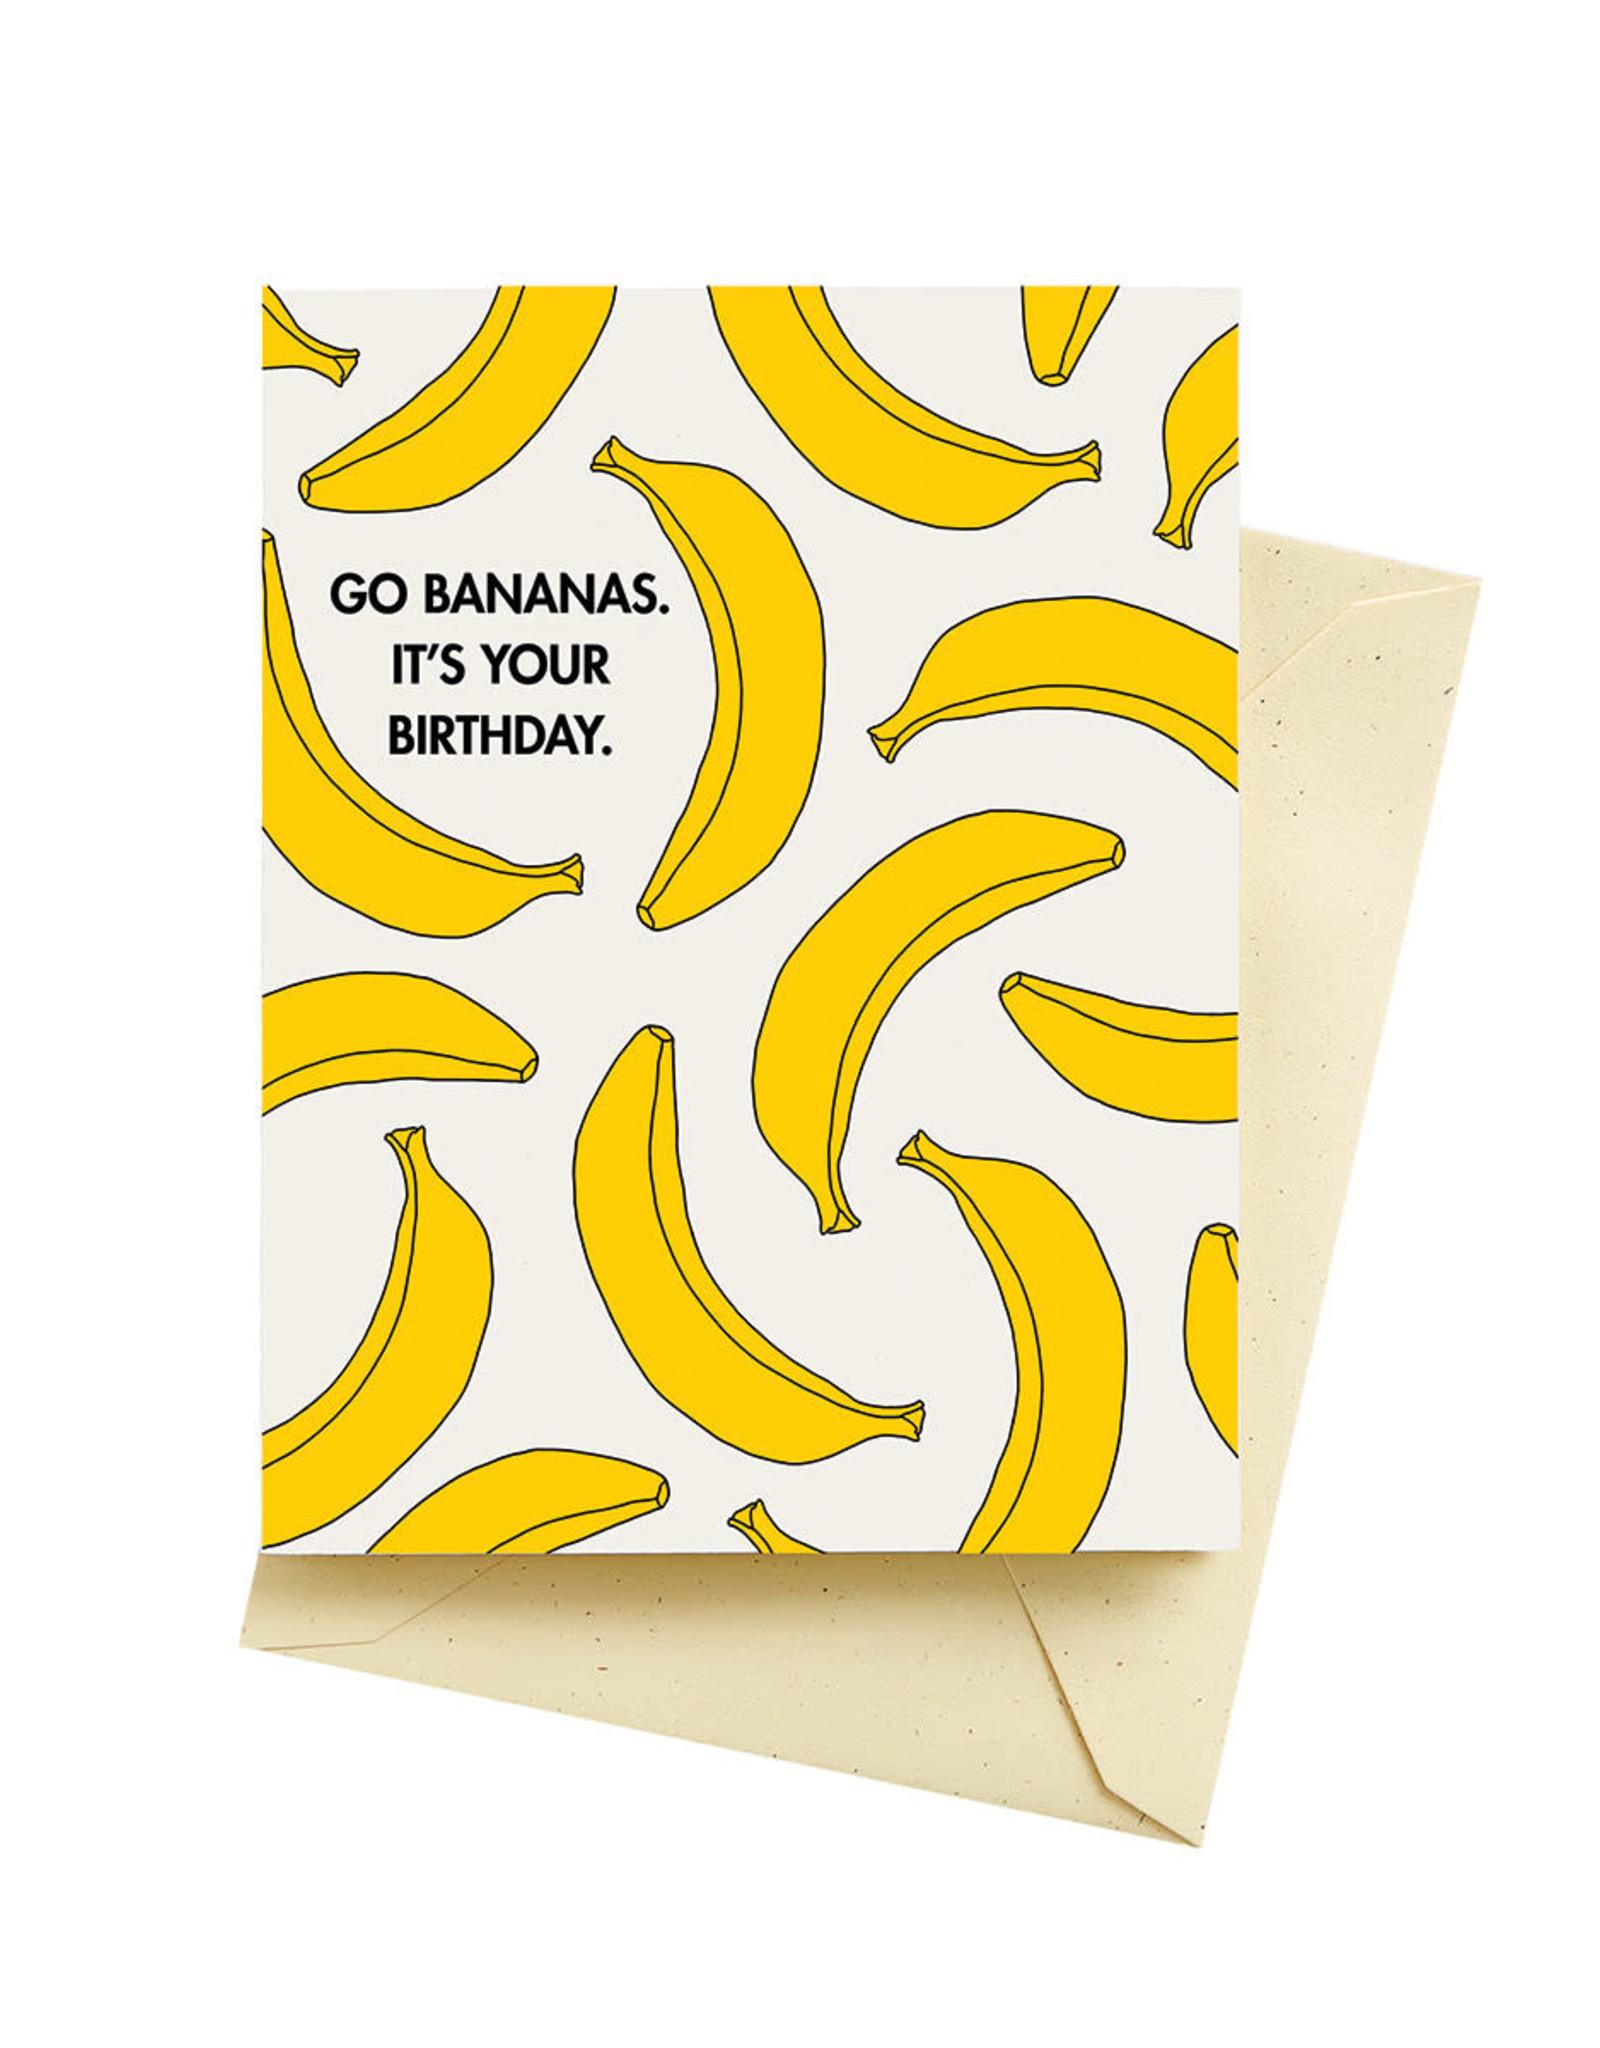 Seltzer Bananas Birthday Greeting Card - Seltzer